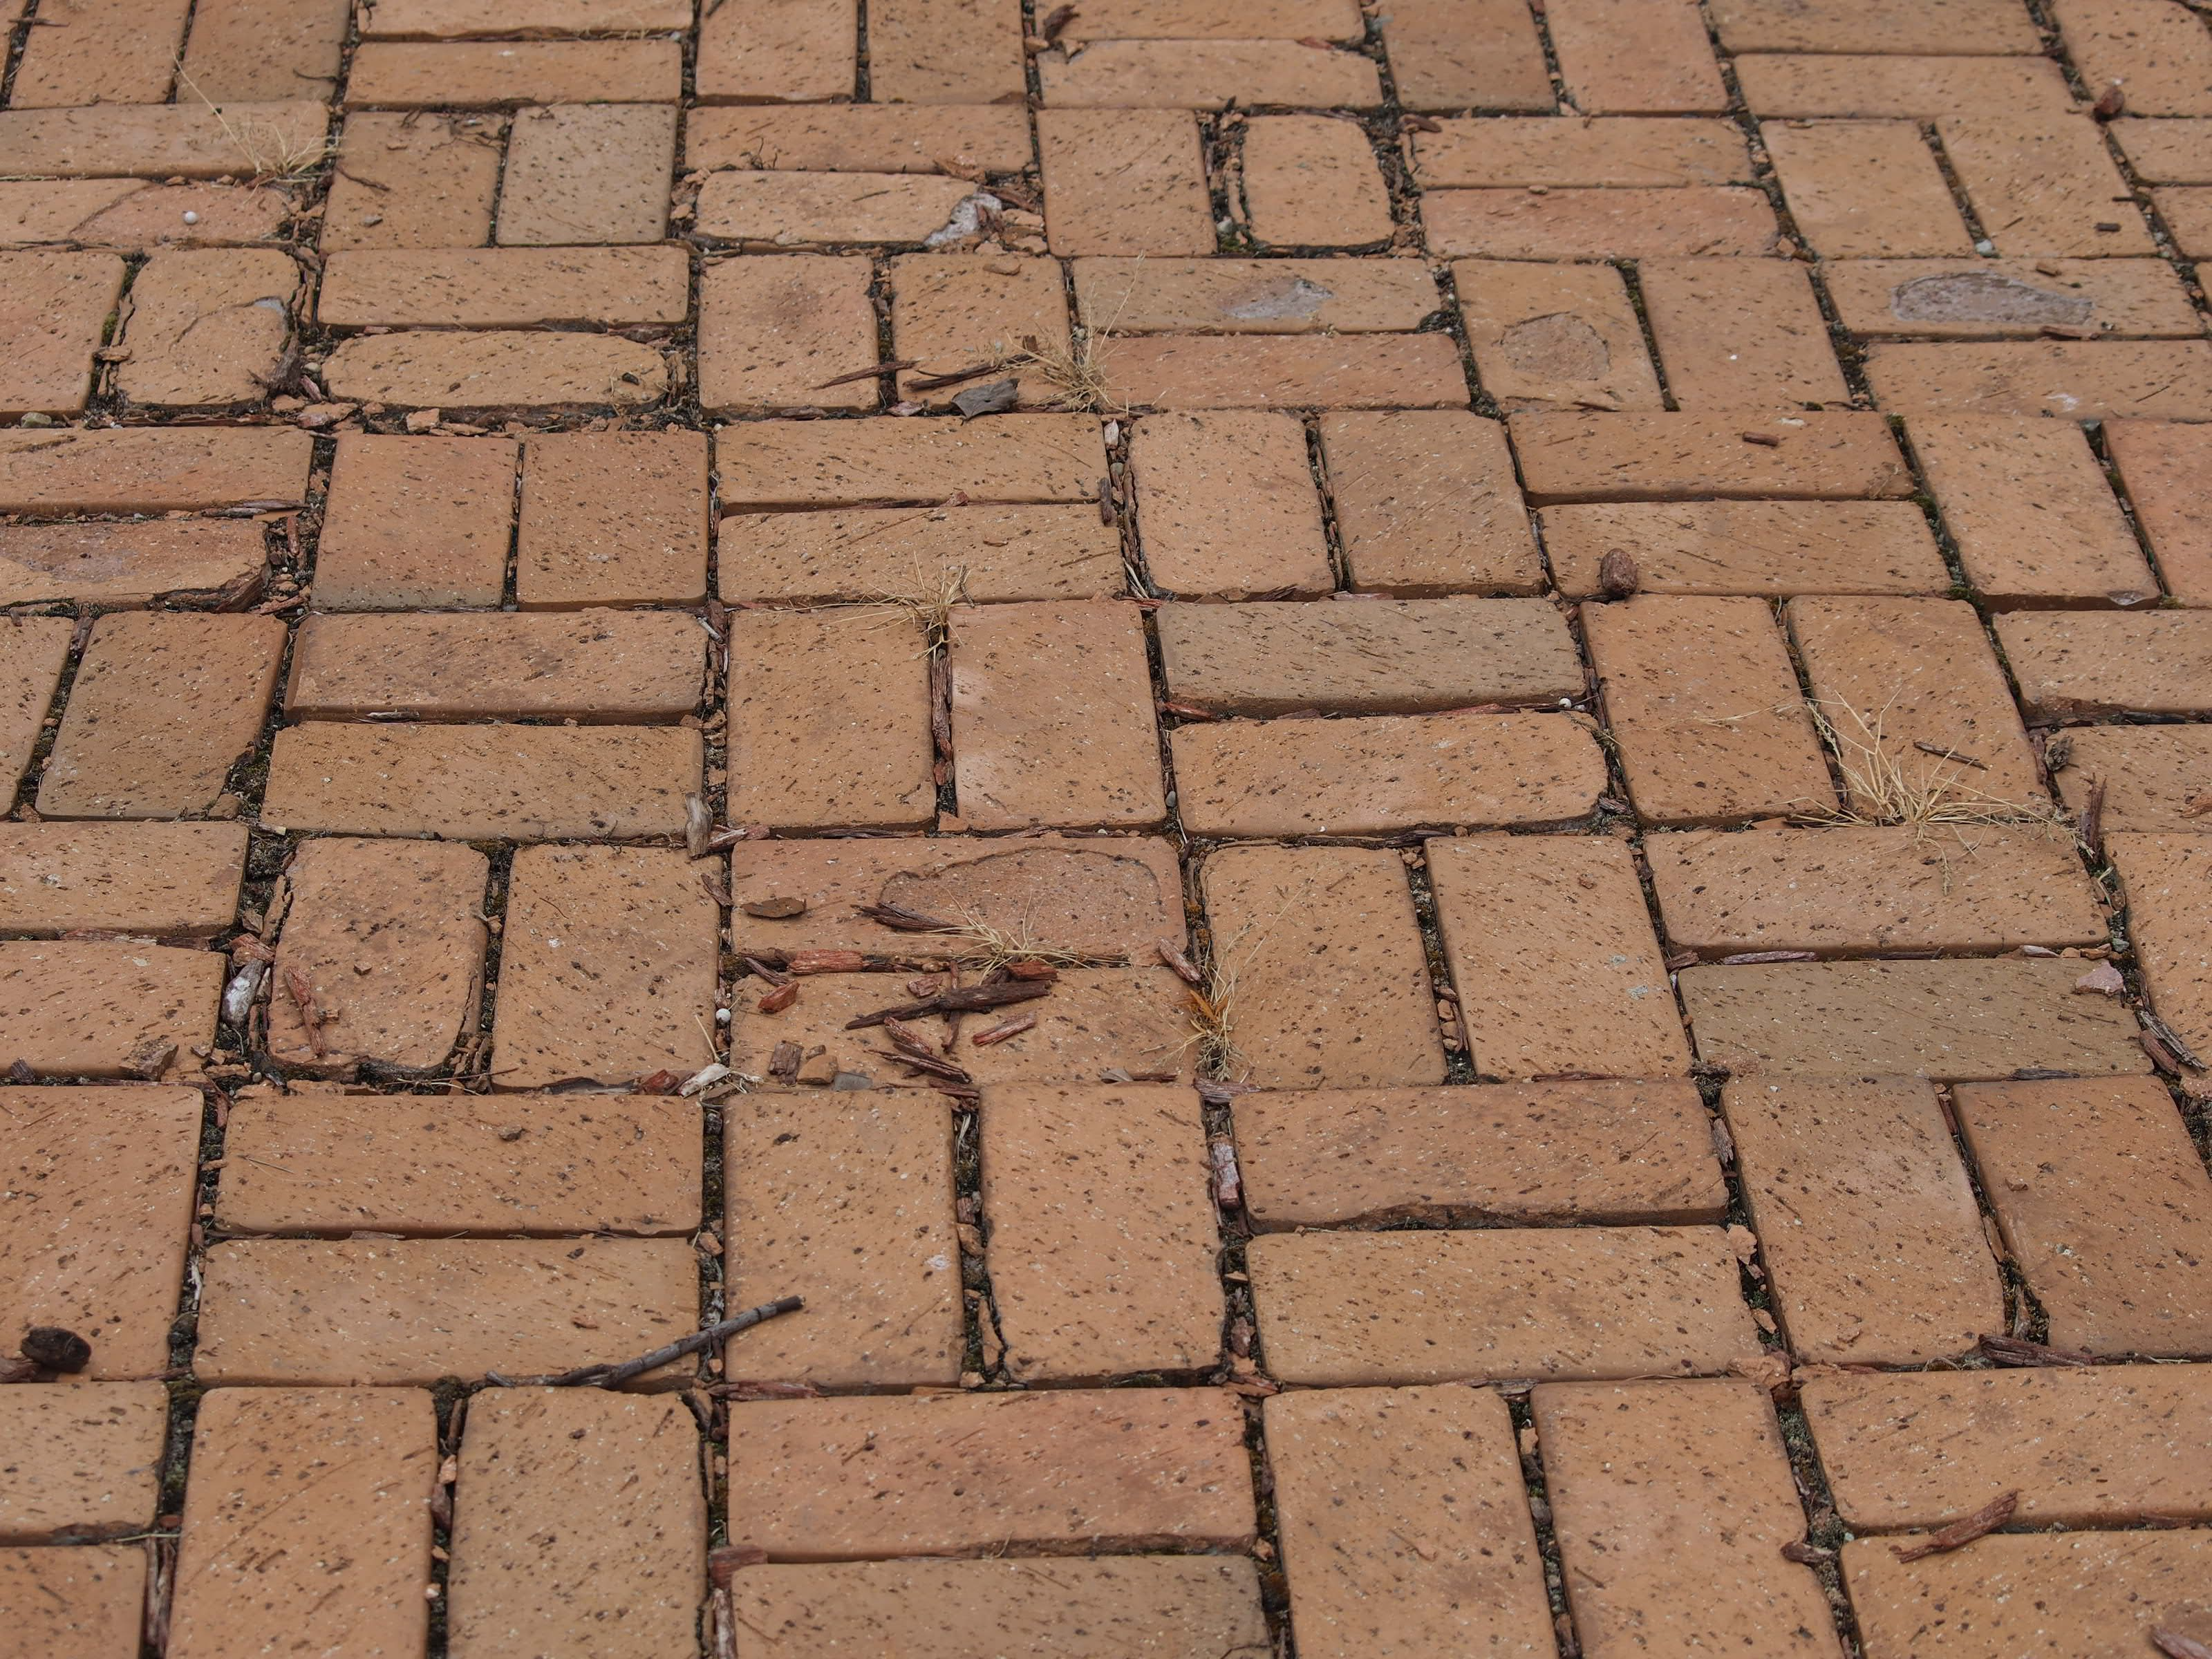 Brick Walkway Basket Weave Pattern